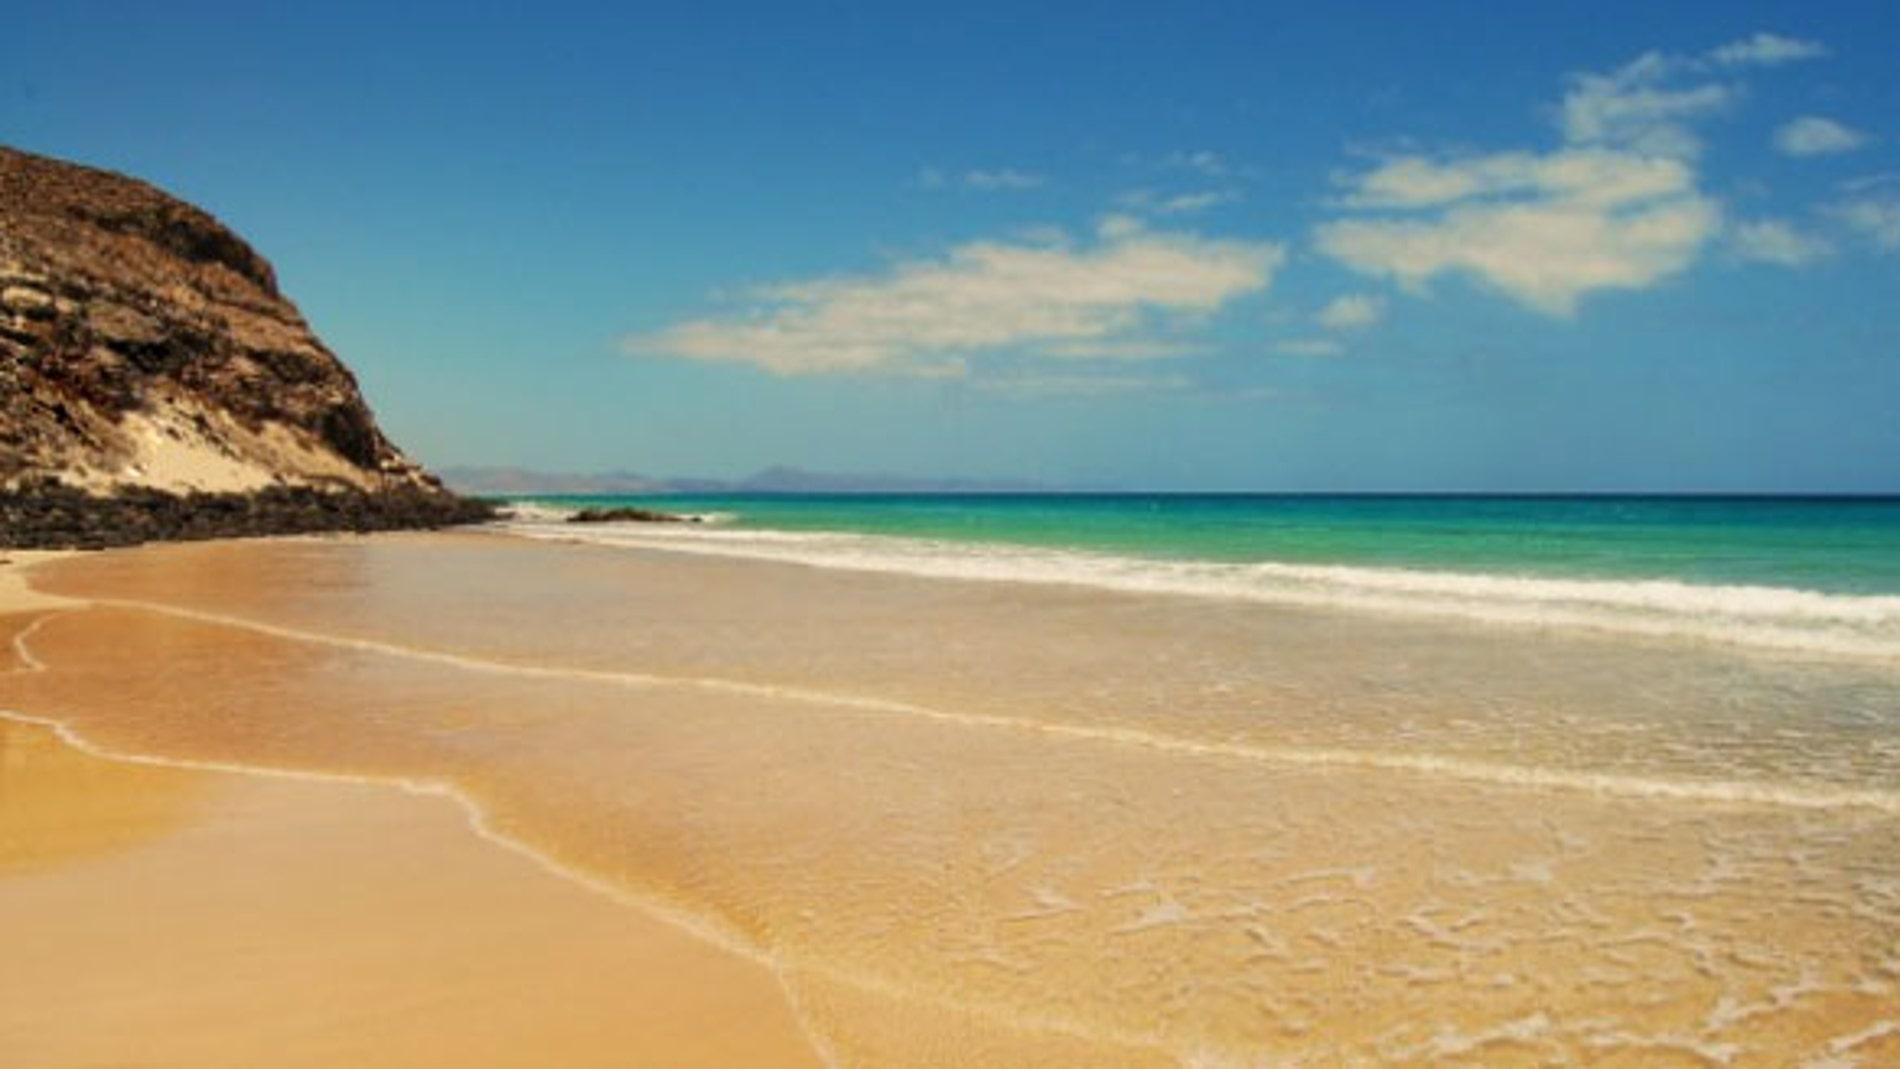 Las exóticas playas solitarias de Fuerteventura